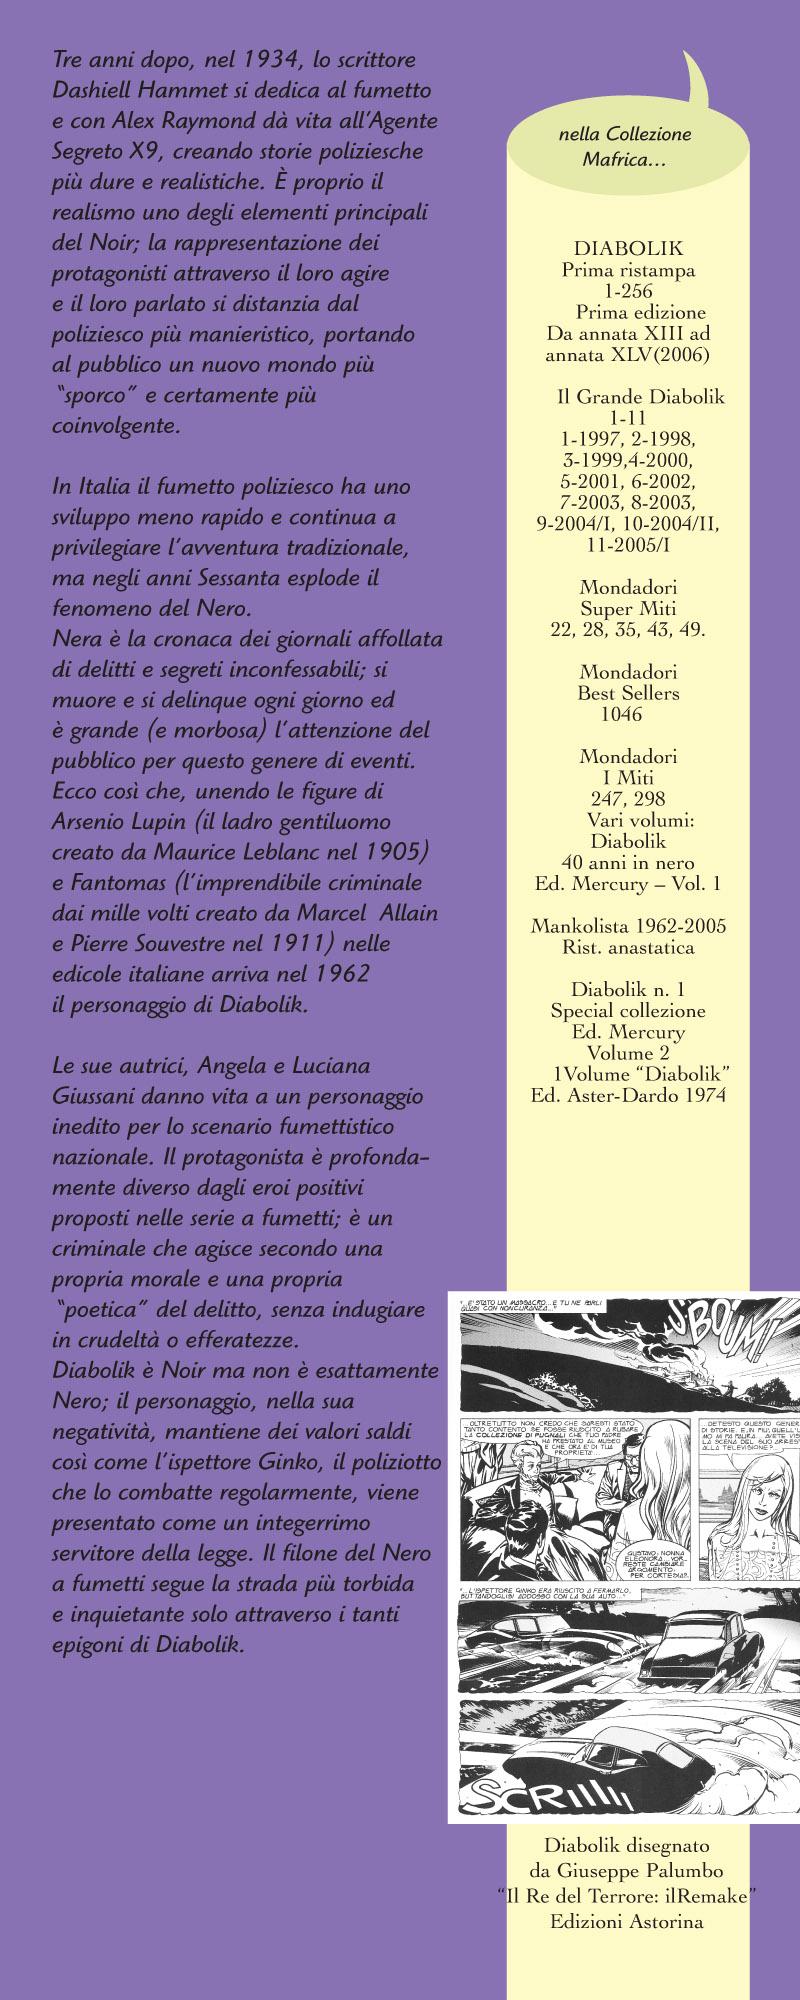 Pannello 3